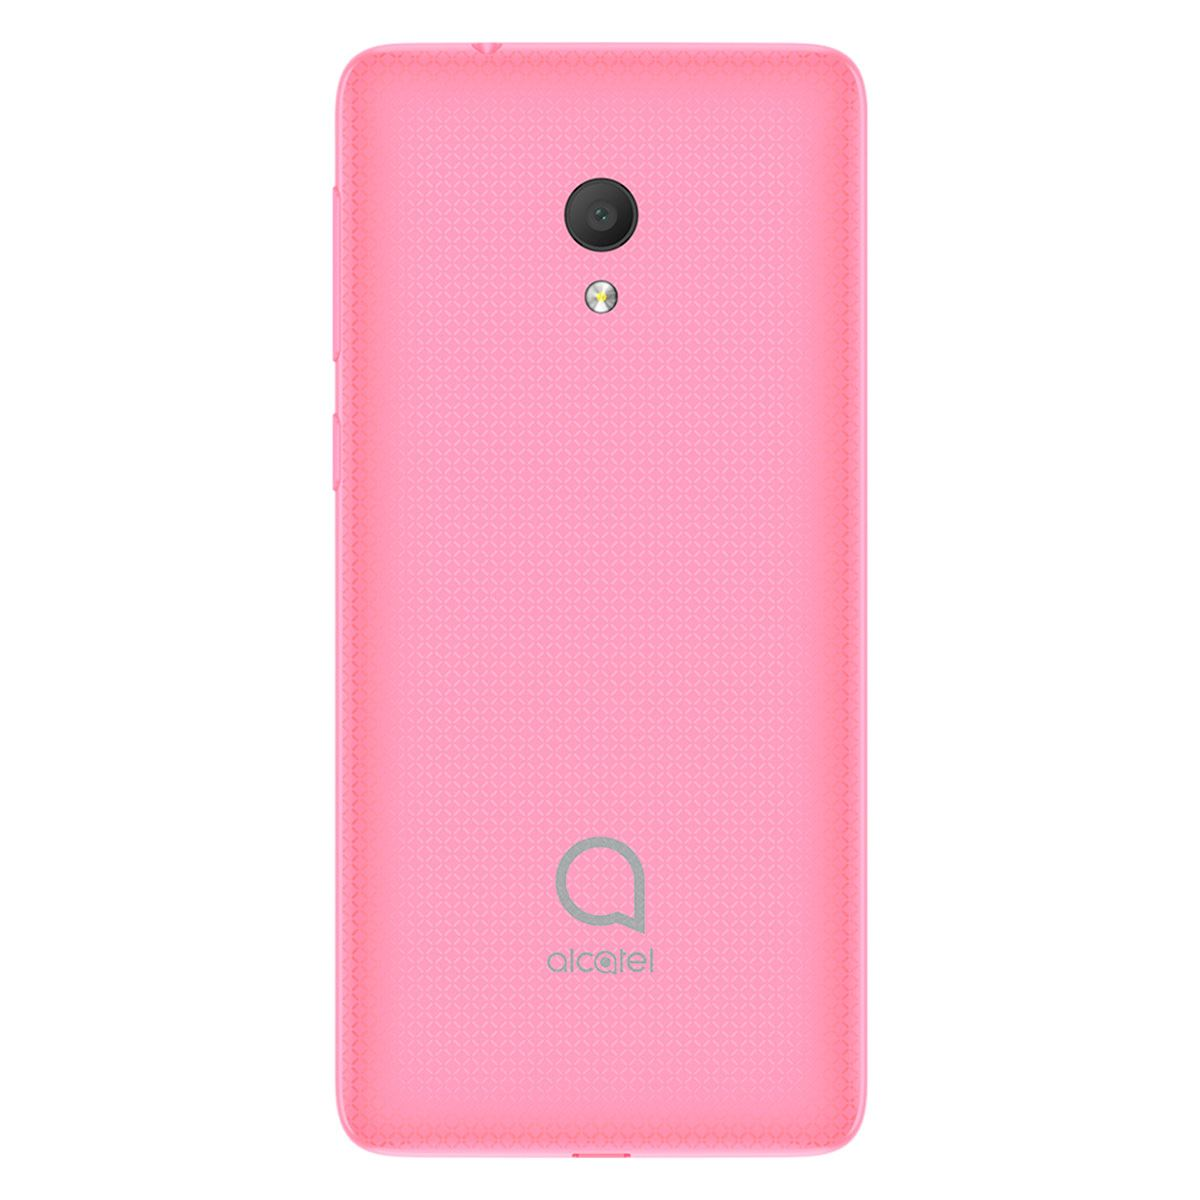 Alcatel 1C 2019 Rosa Telcel R9